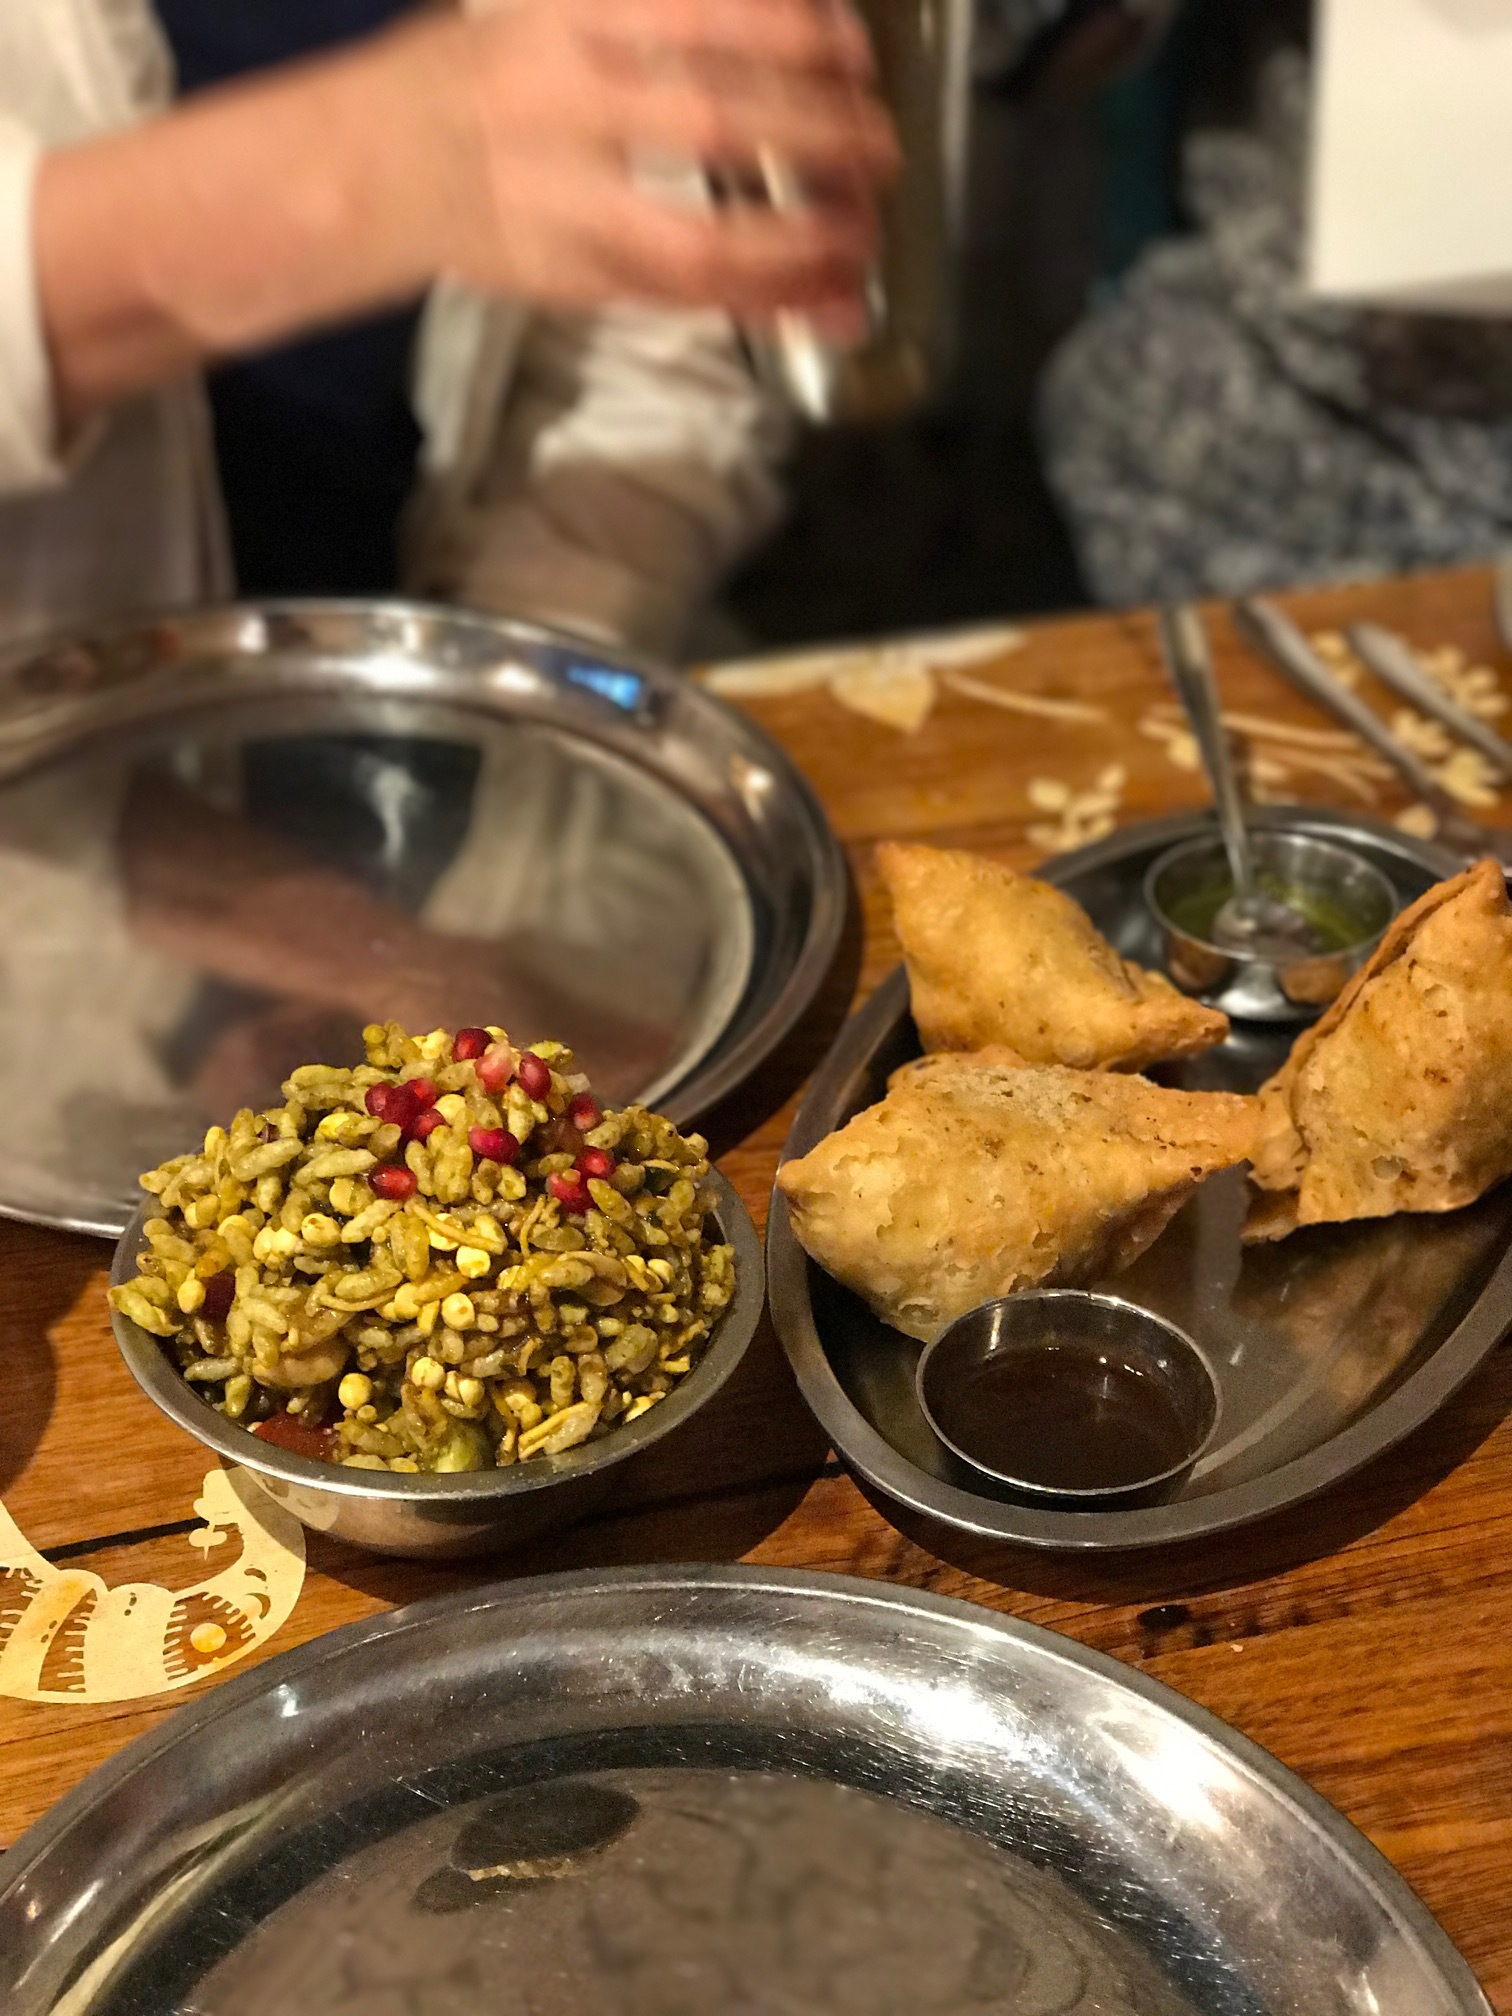 mukka_best_vegan_indian_food_restaurant_melbourne.jpg